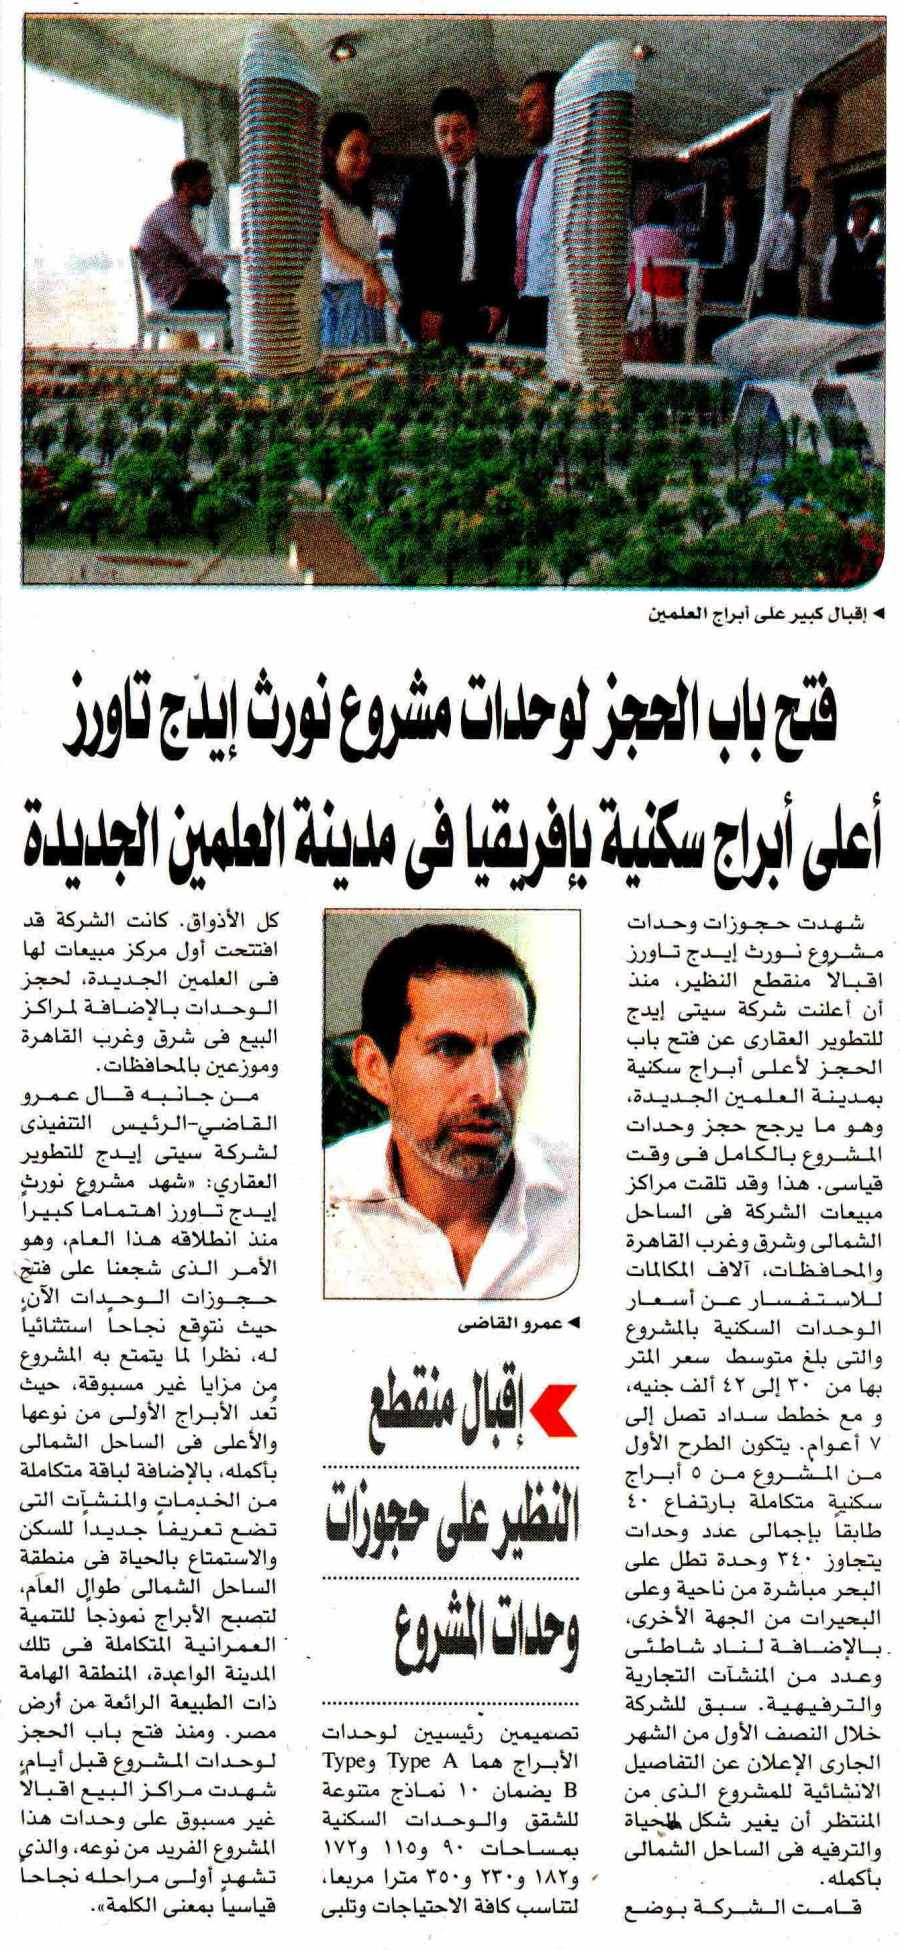 Akhbar Al Youm 28 July P.20 B.jpg